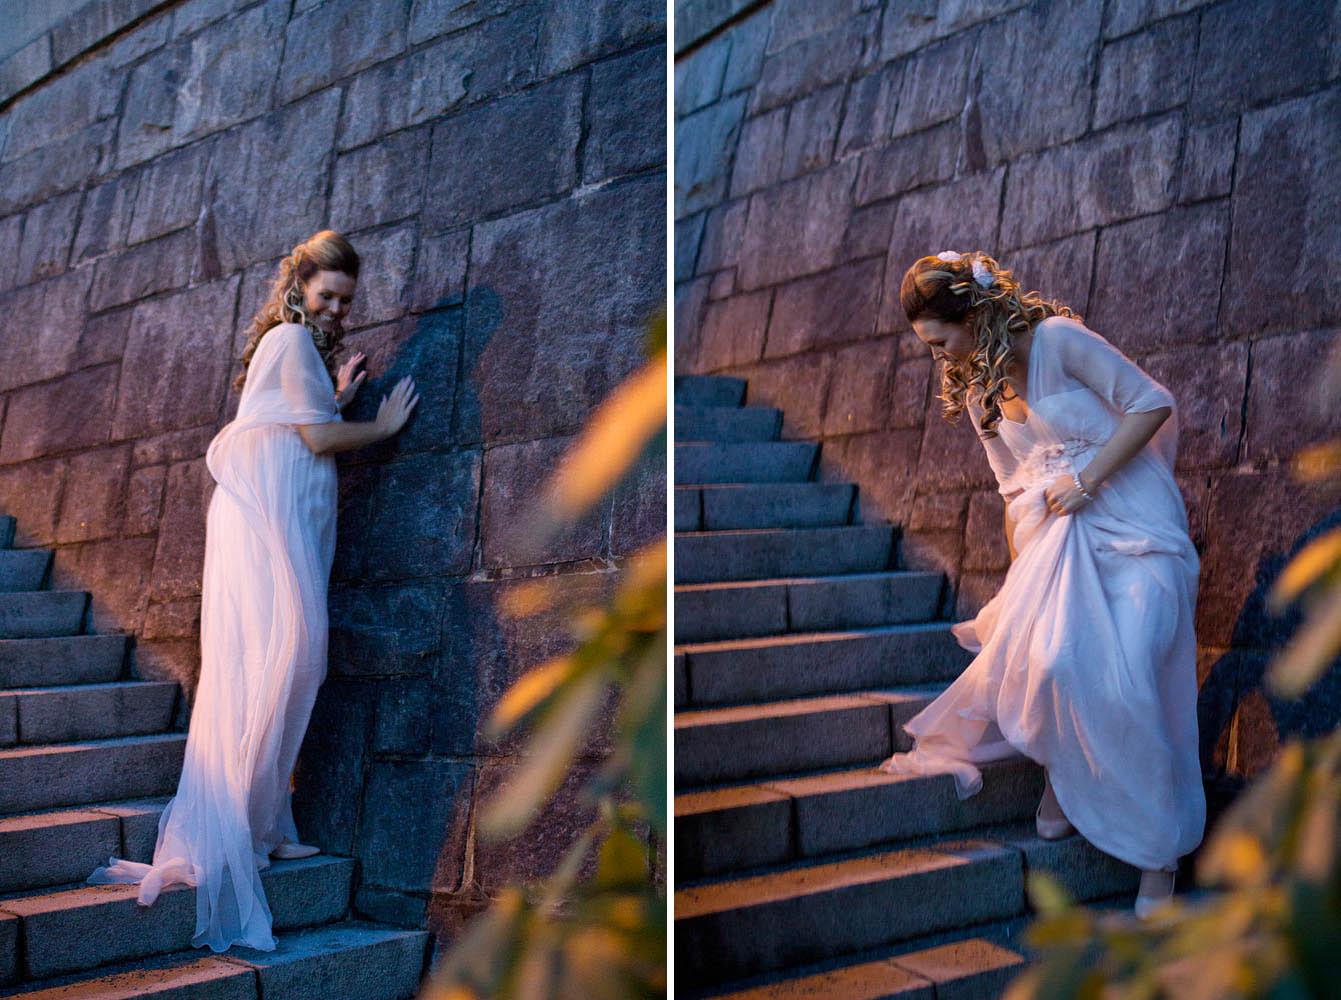 RivetsAndRoses, Desiree Mostad, Leila Hafzi dress, Bryllup, Haugesund, Stavanger, Norge